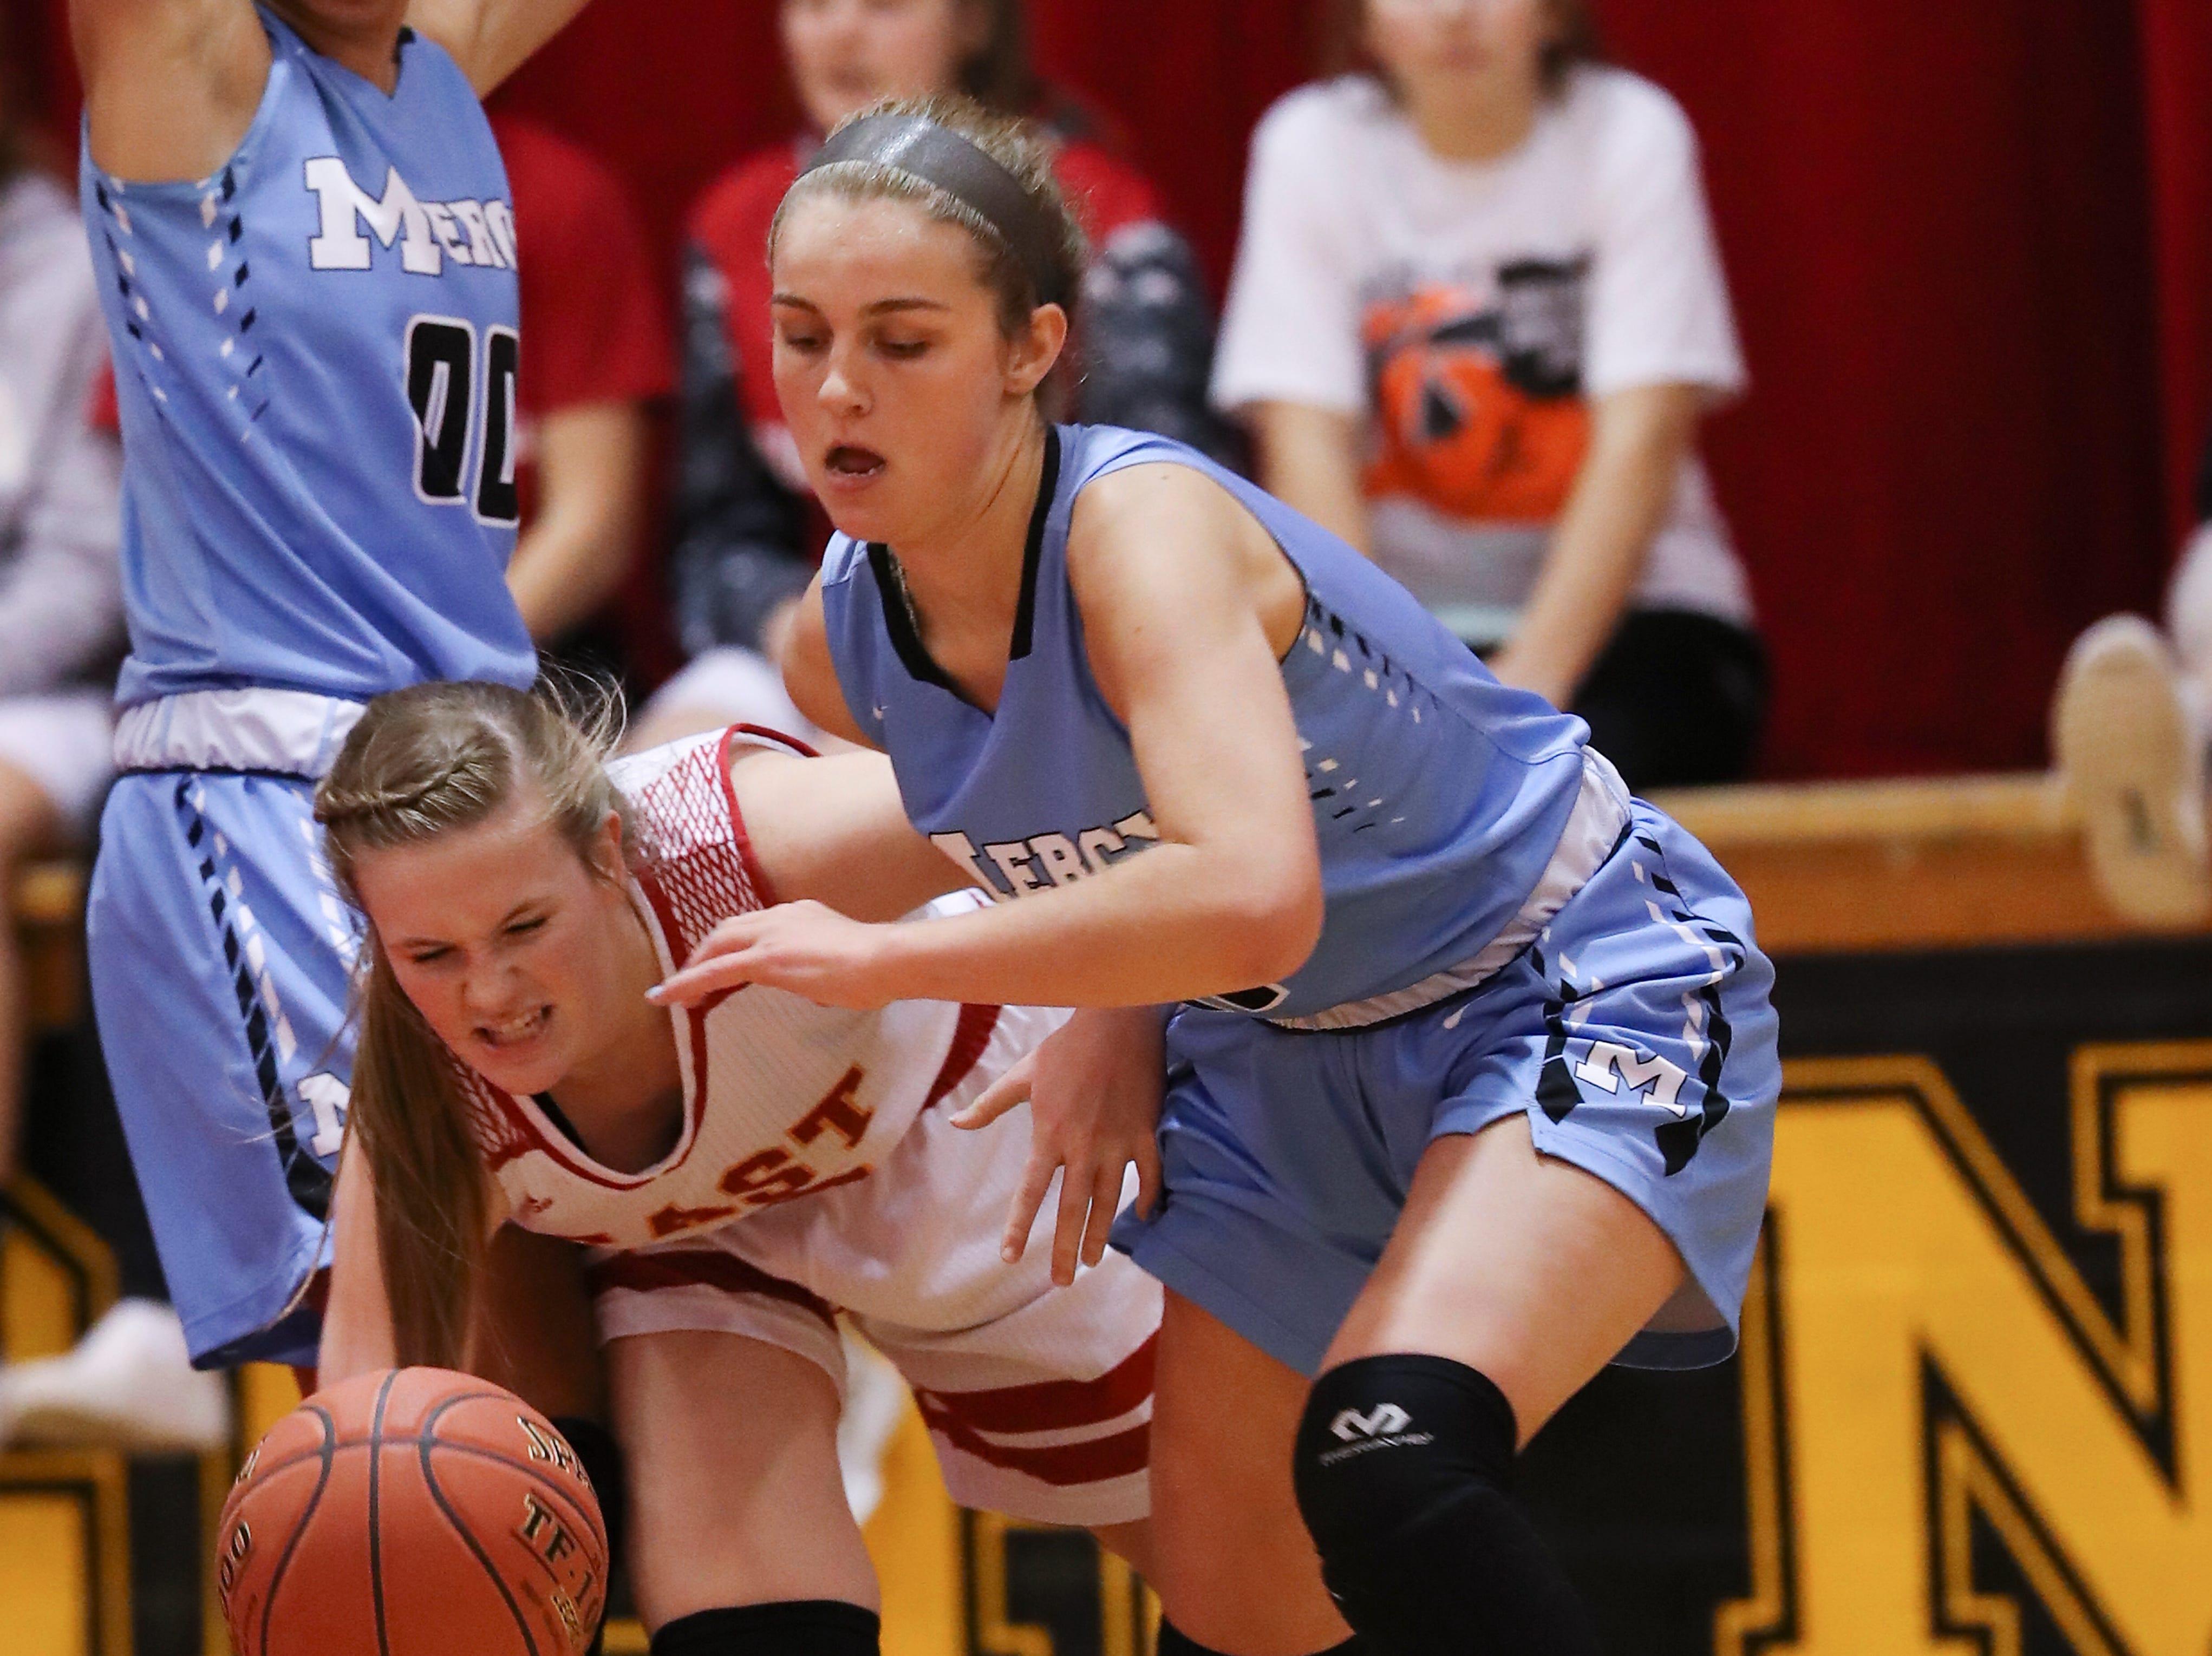 Mercy's Paige Taylor (11) chased a loose ball against Bullitt East's Lexi Taylor (15) at the Bullitt East High School.Jan. 9, 2019